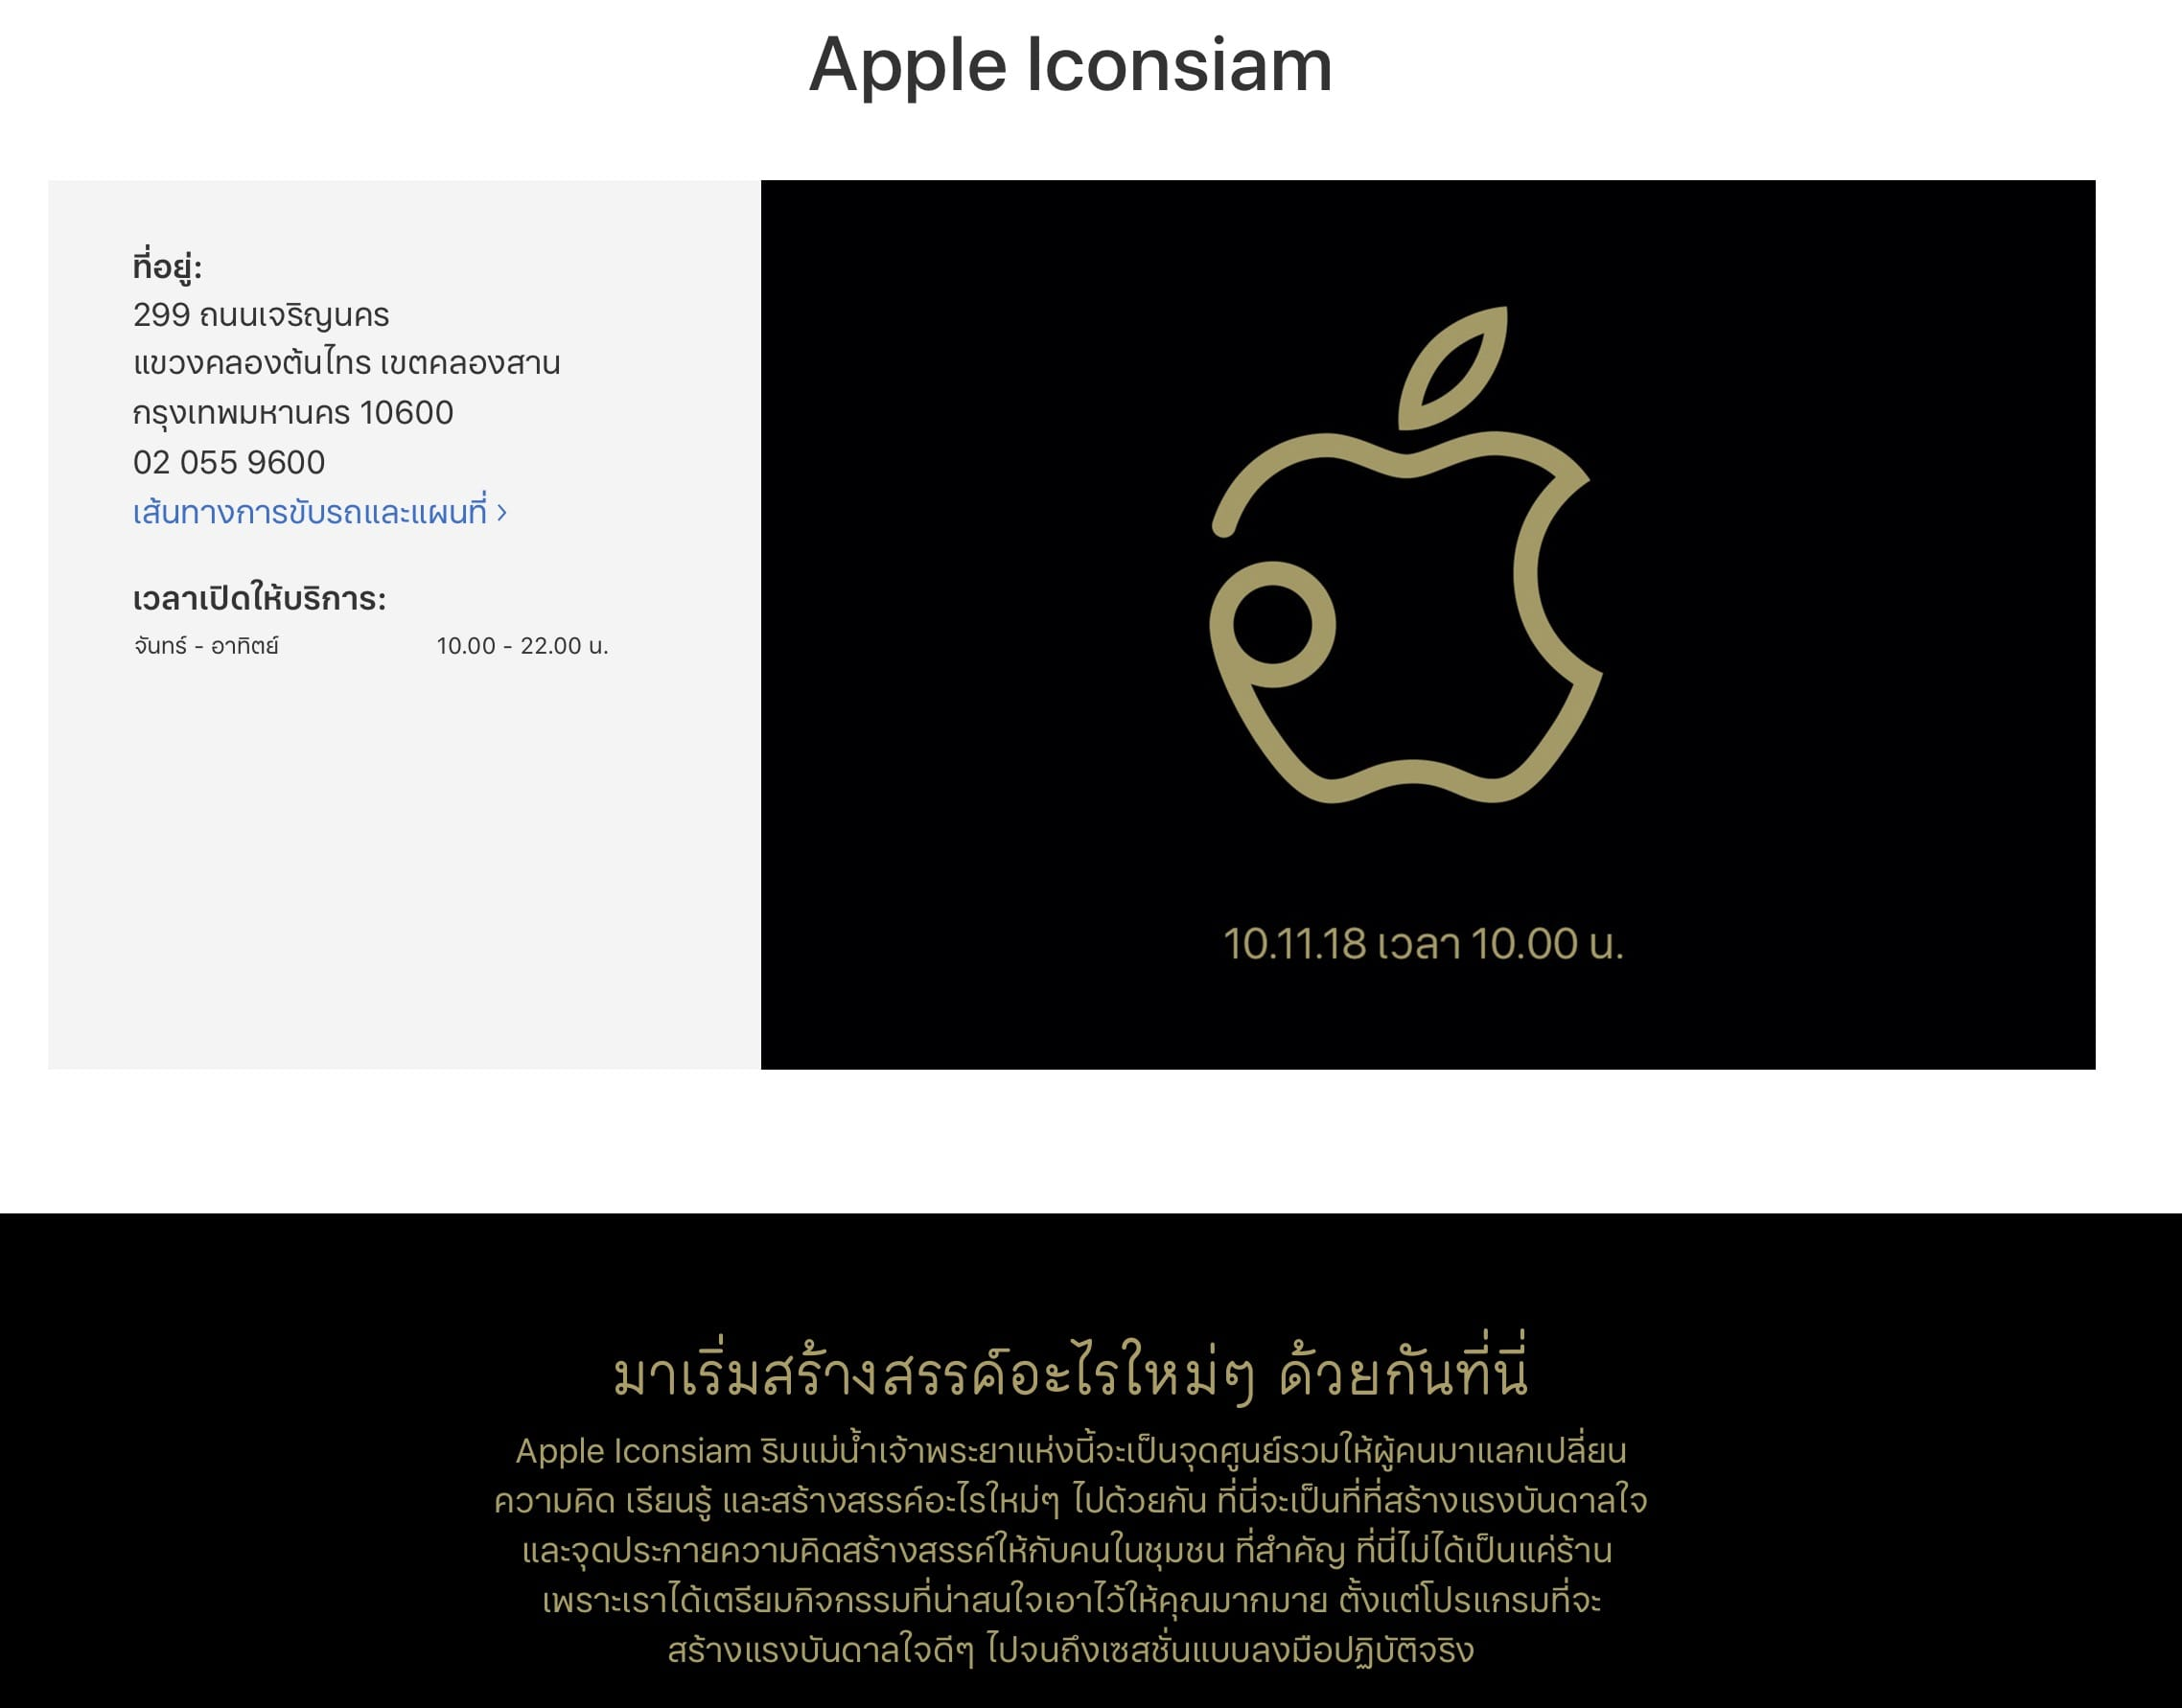 Apple Iconsiam Detail